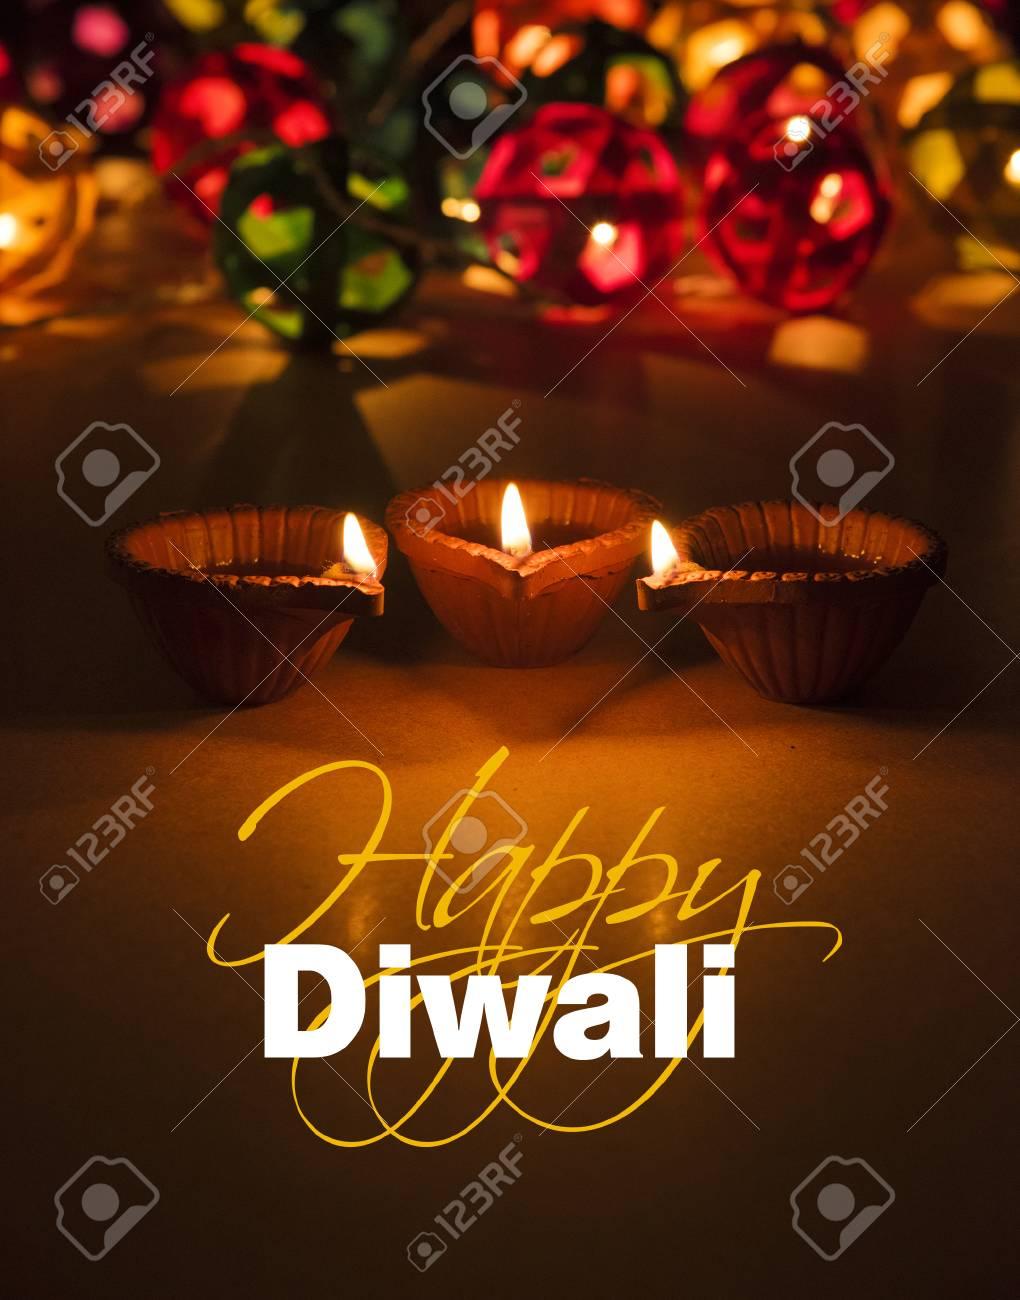 Stock Photo Of Diwali Greeting Card Showing Illuminated Diya Stock